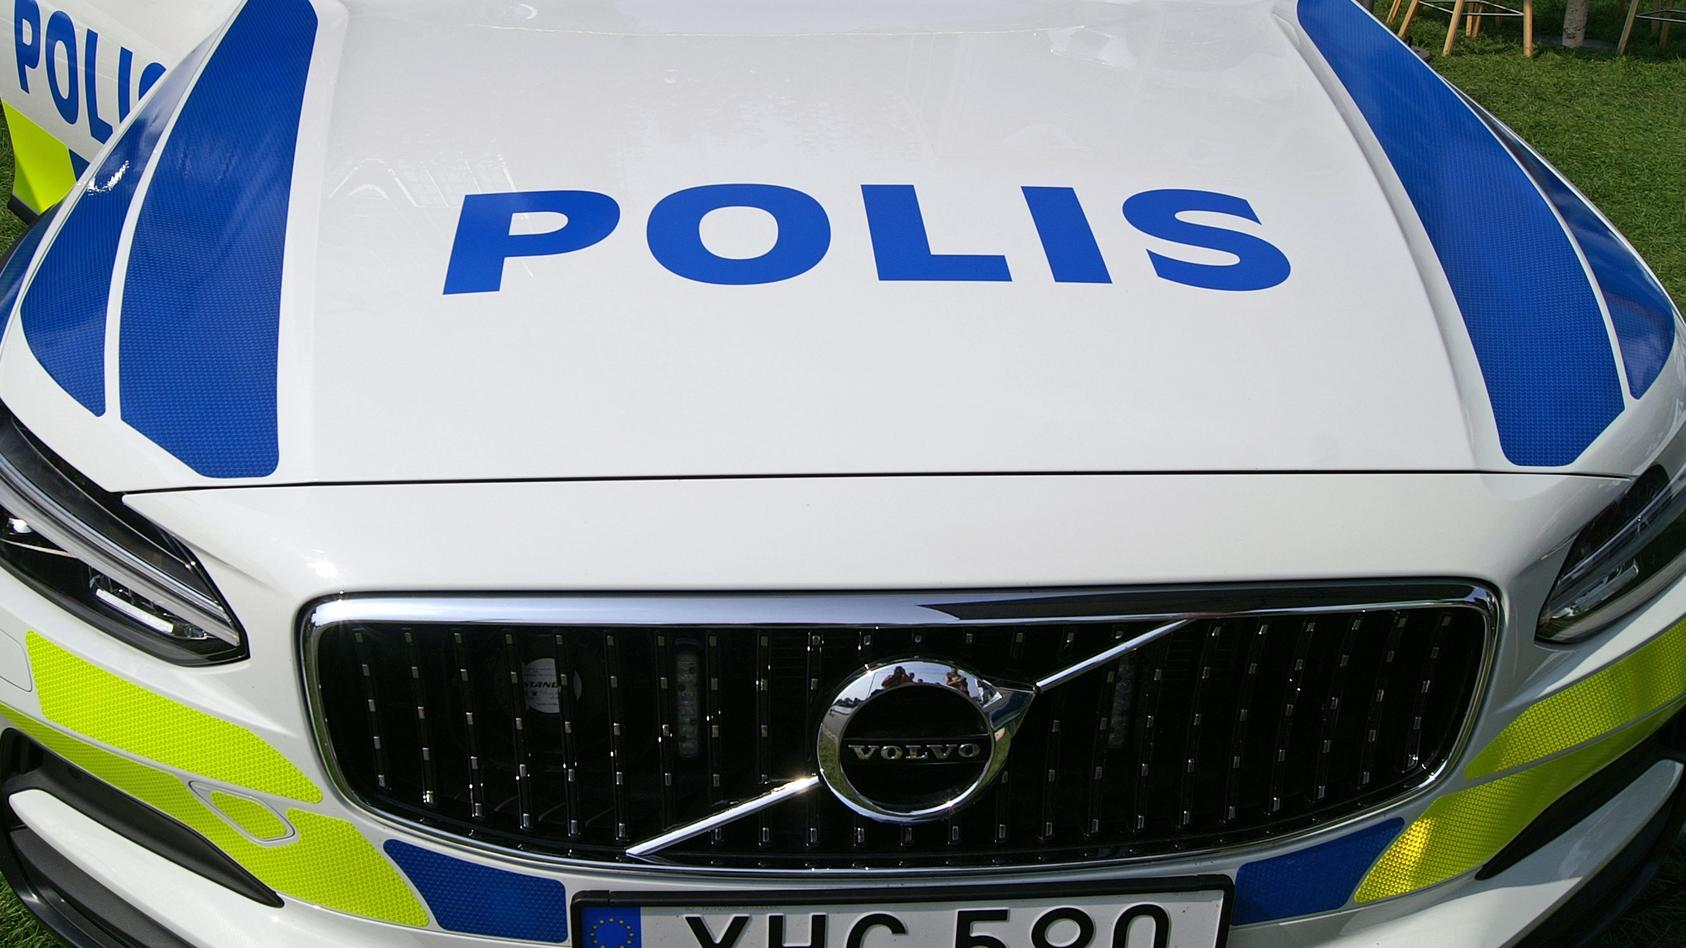 Polizei. Schweden Polis. Fahrzeug